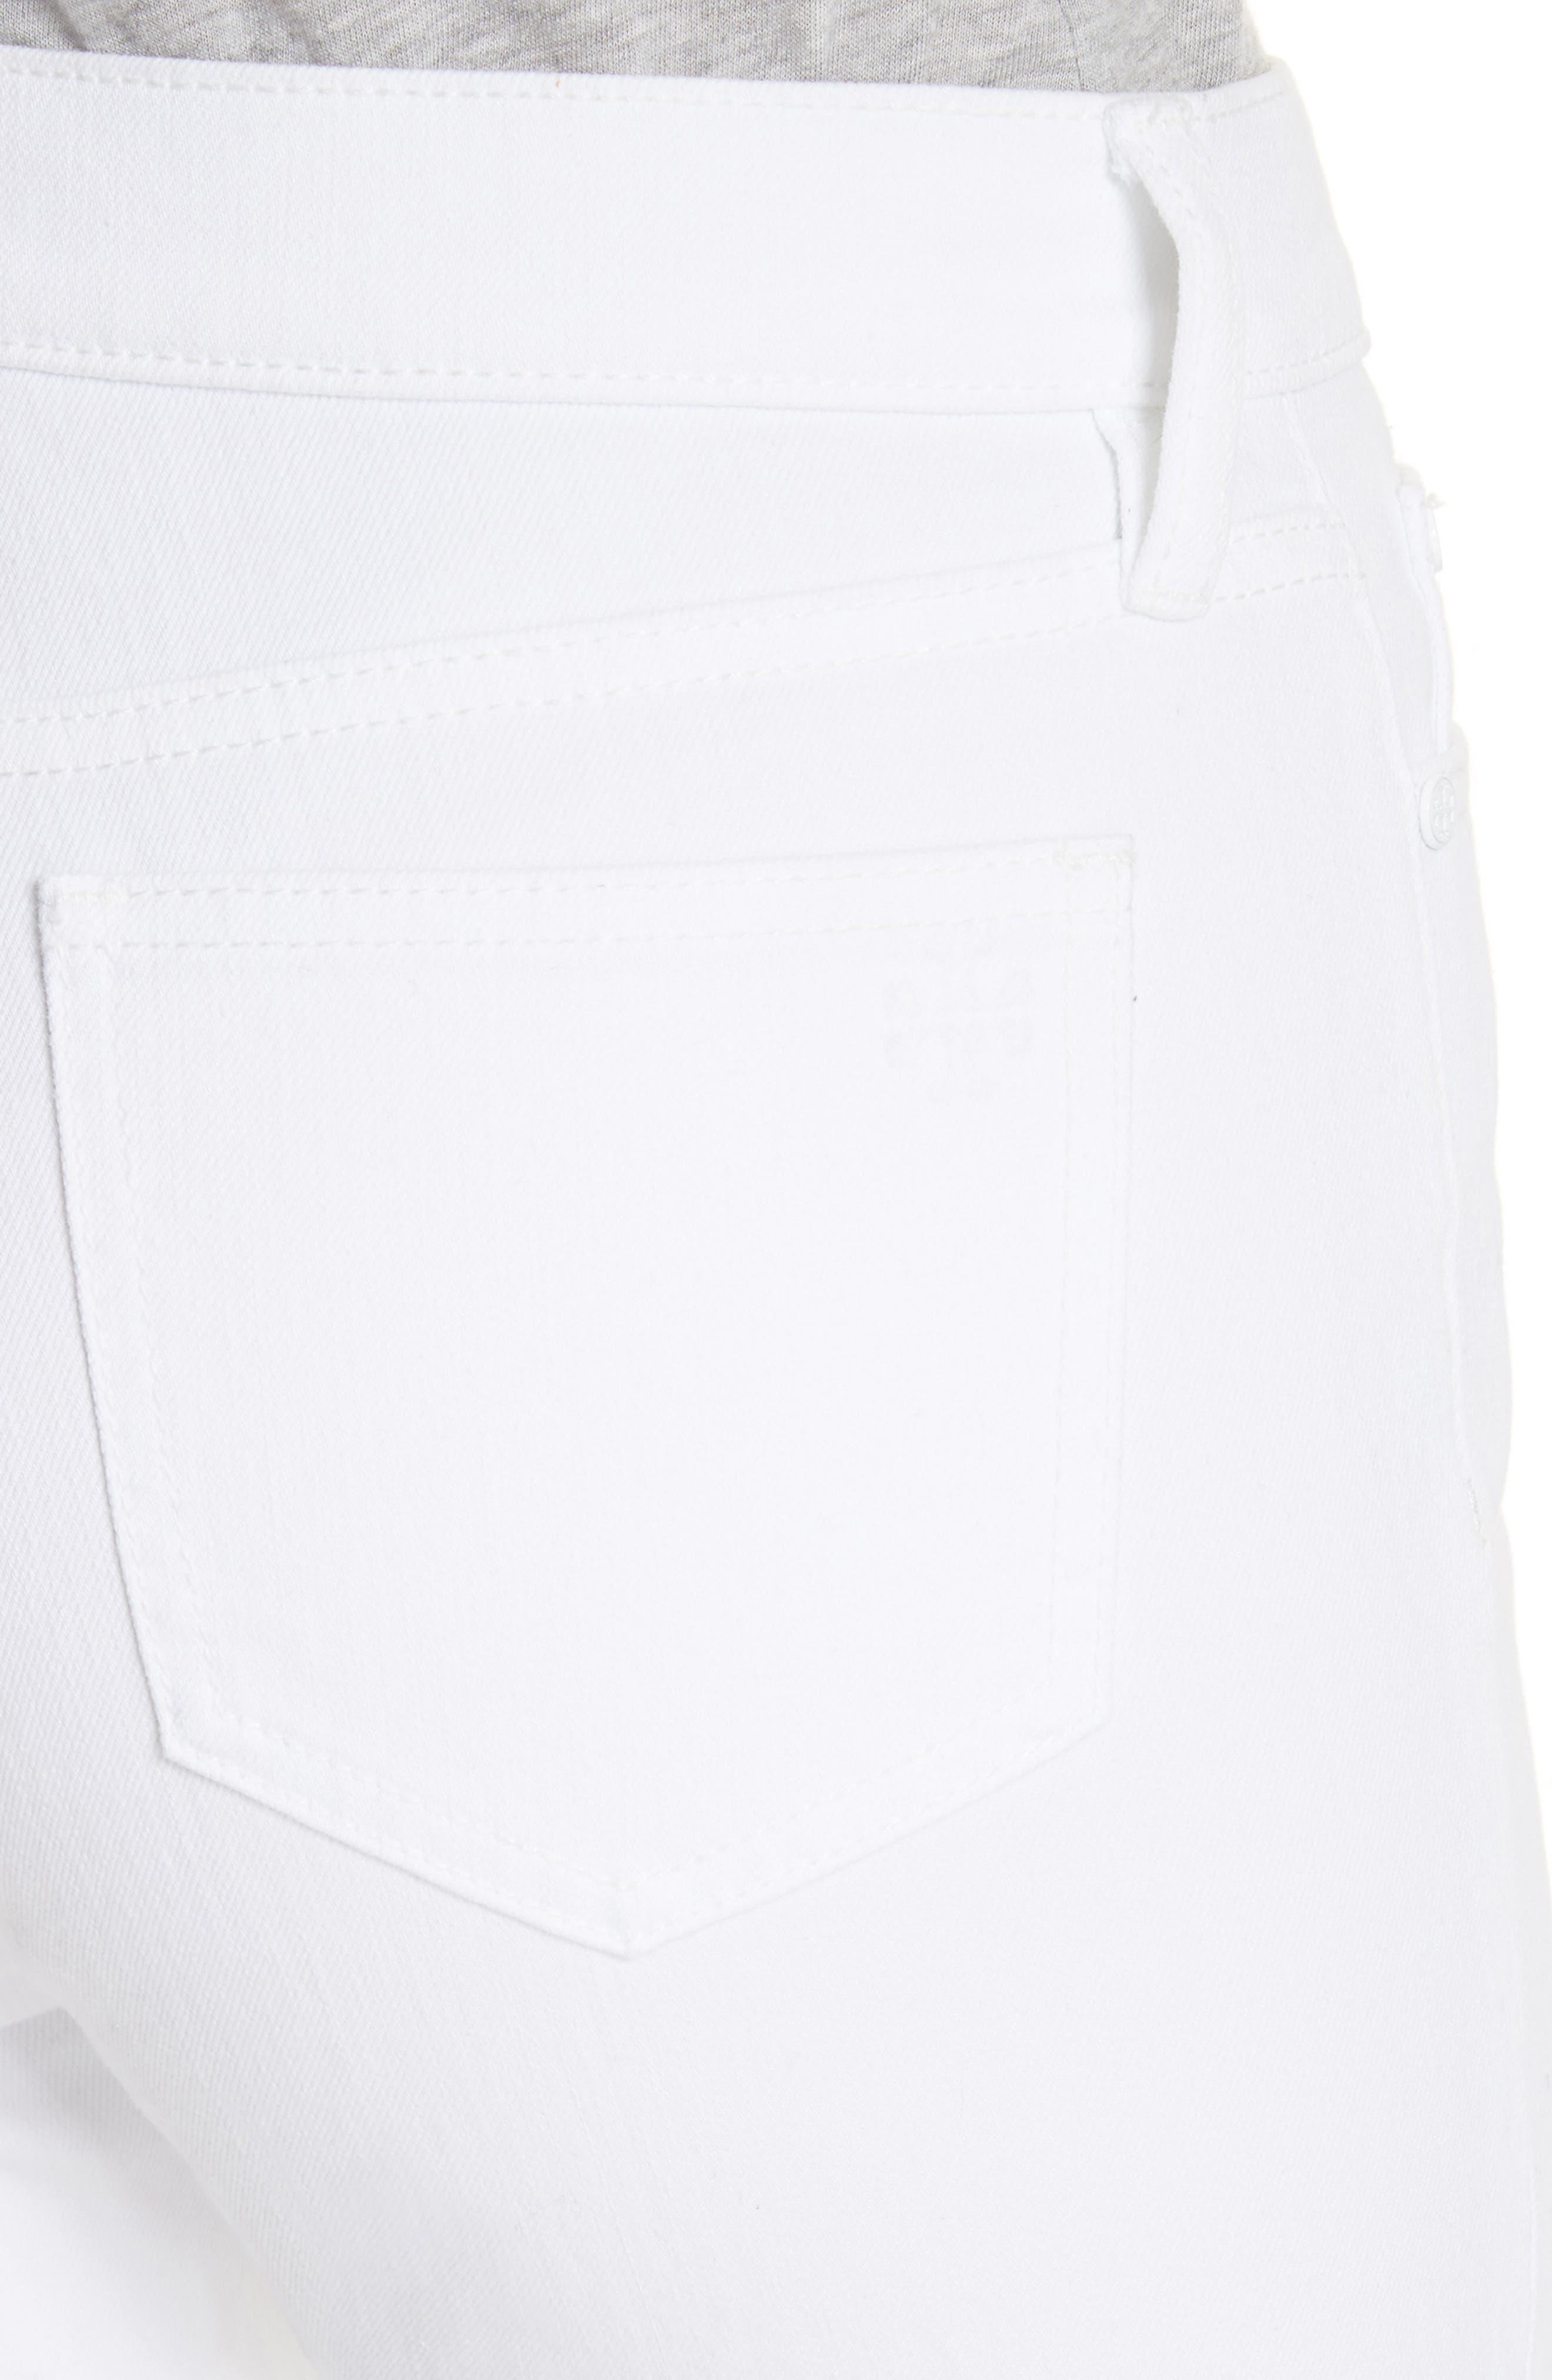 Keira Eyelet Hem Crop Jeans,                             Alternate thumbnail 4, color,                             Rinse Wash